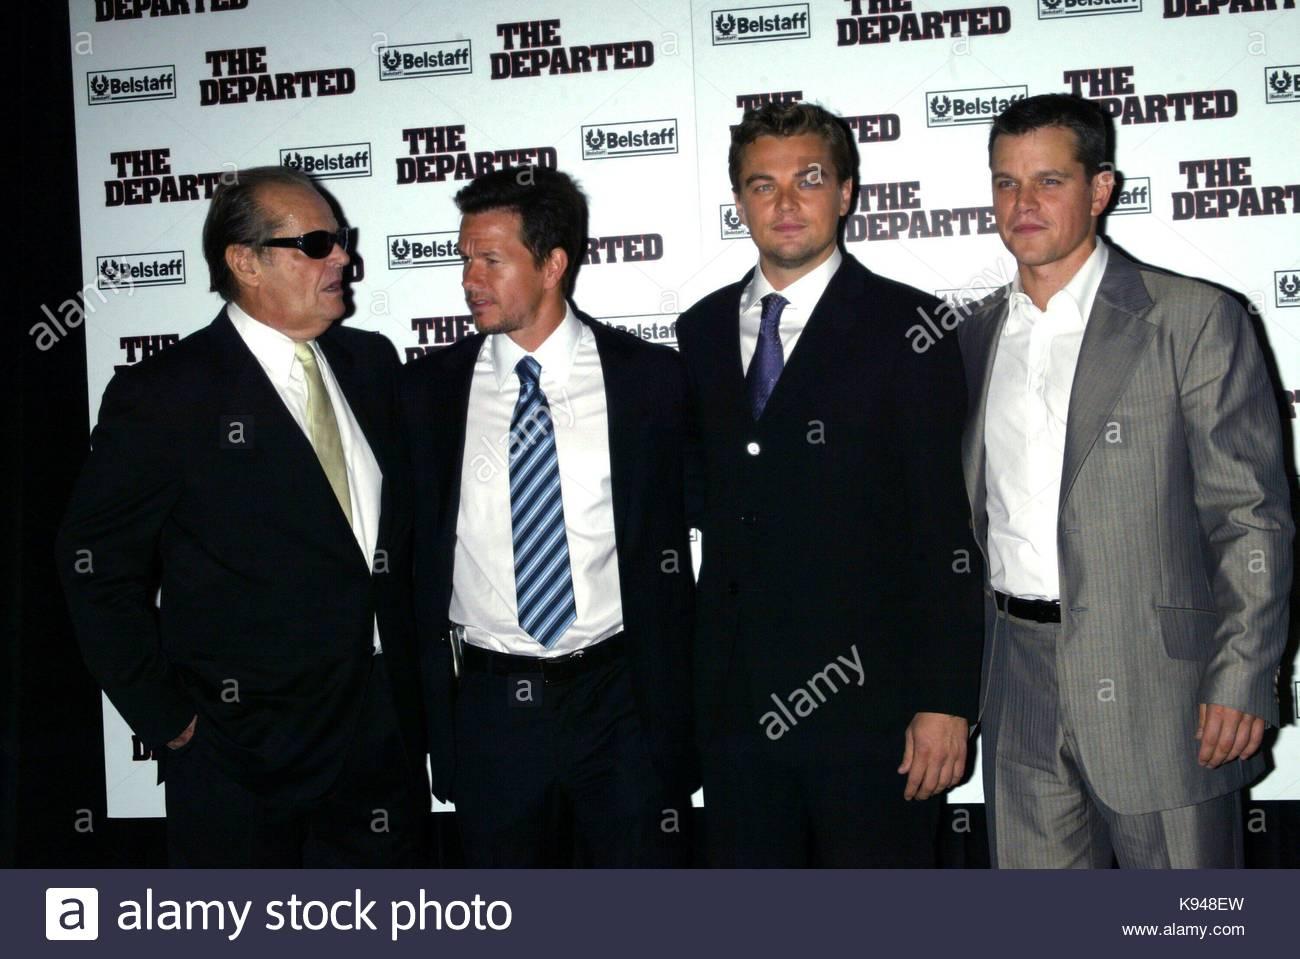 Leonardo Dicaprio Mark Wahlberg Jack Nicholson Y Matt Damon The